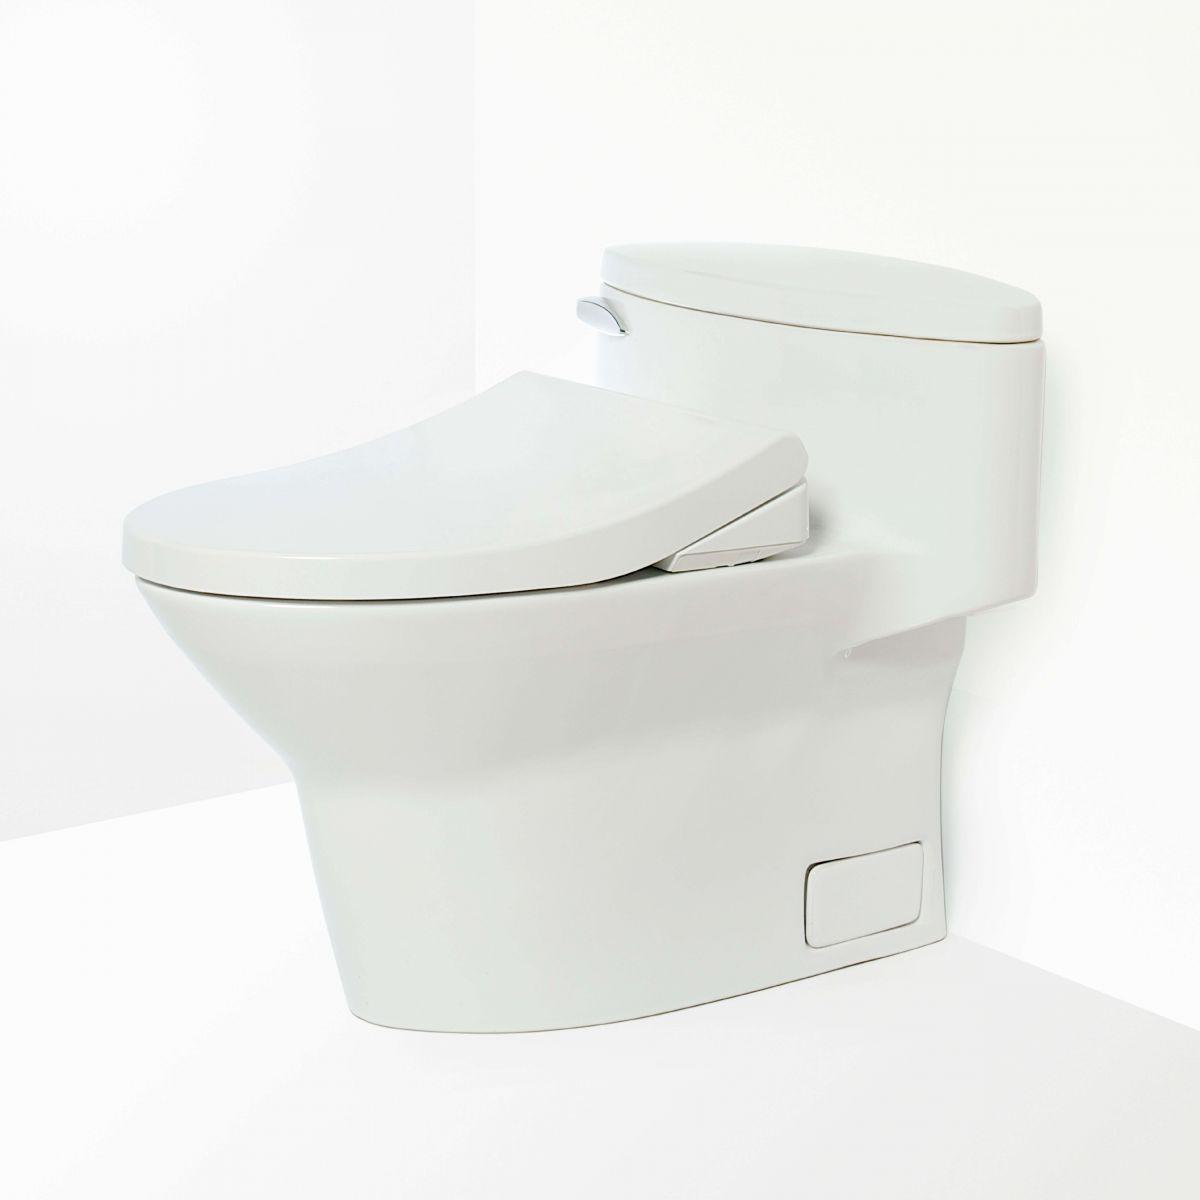 bồn cầu toto eco washer MS904E4